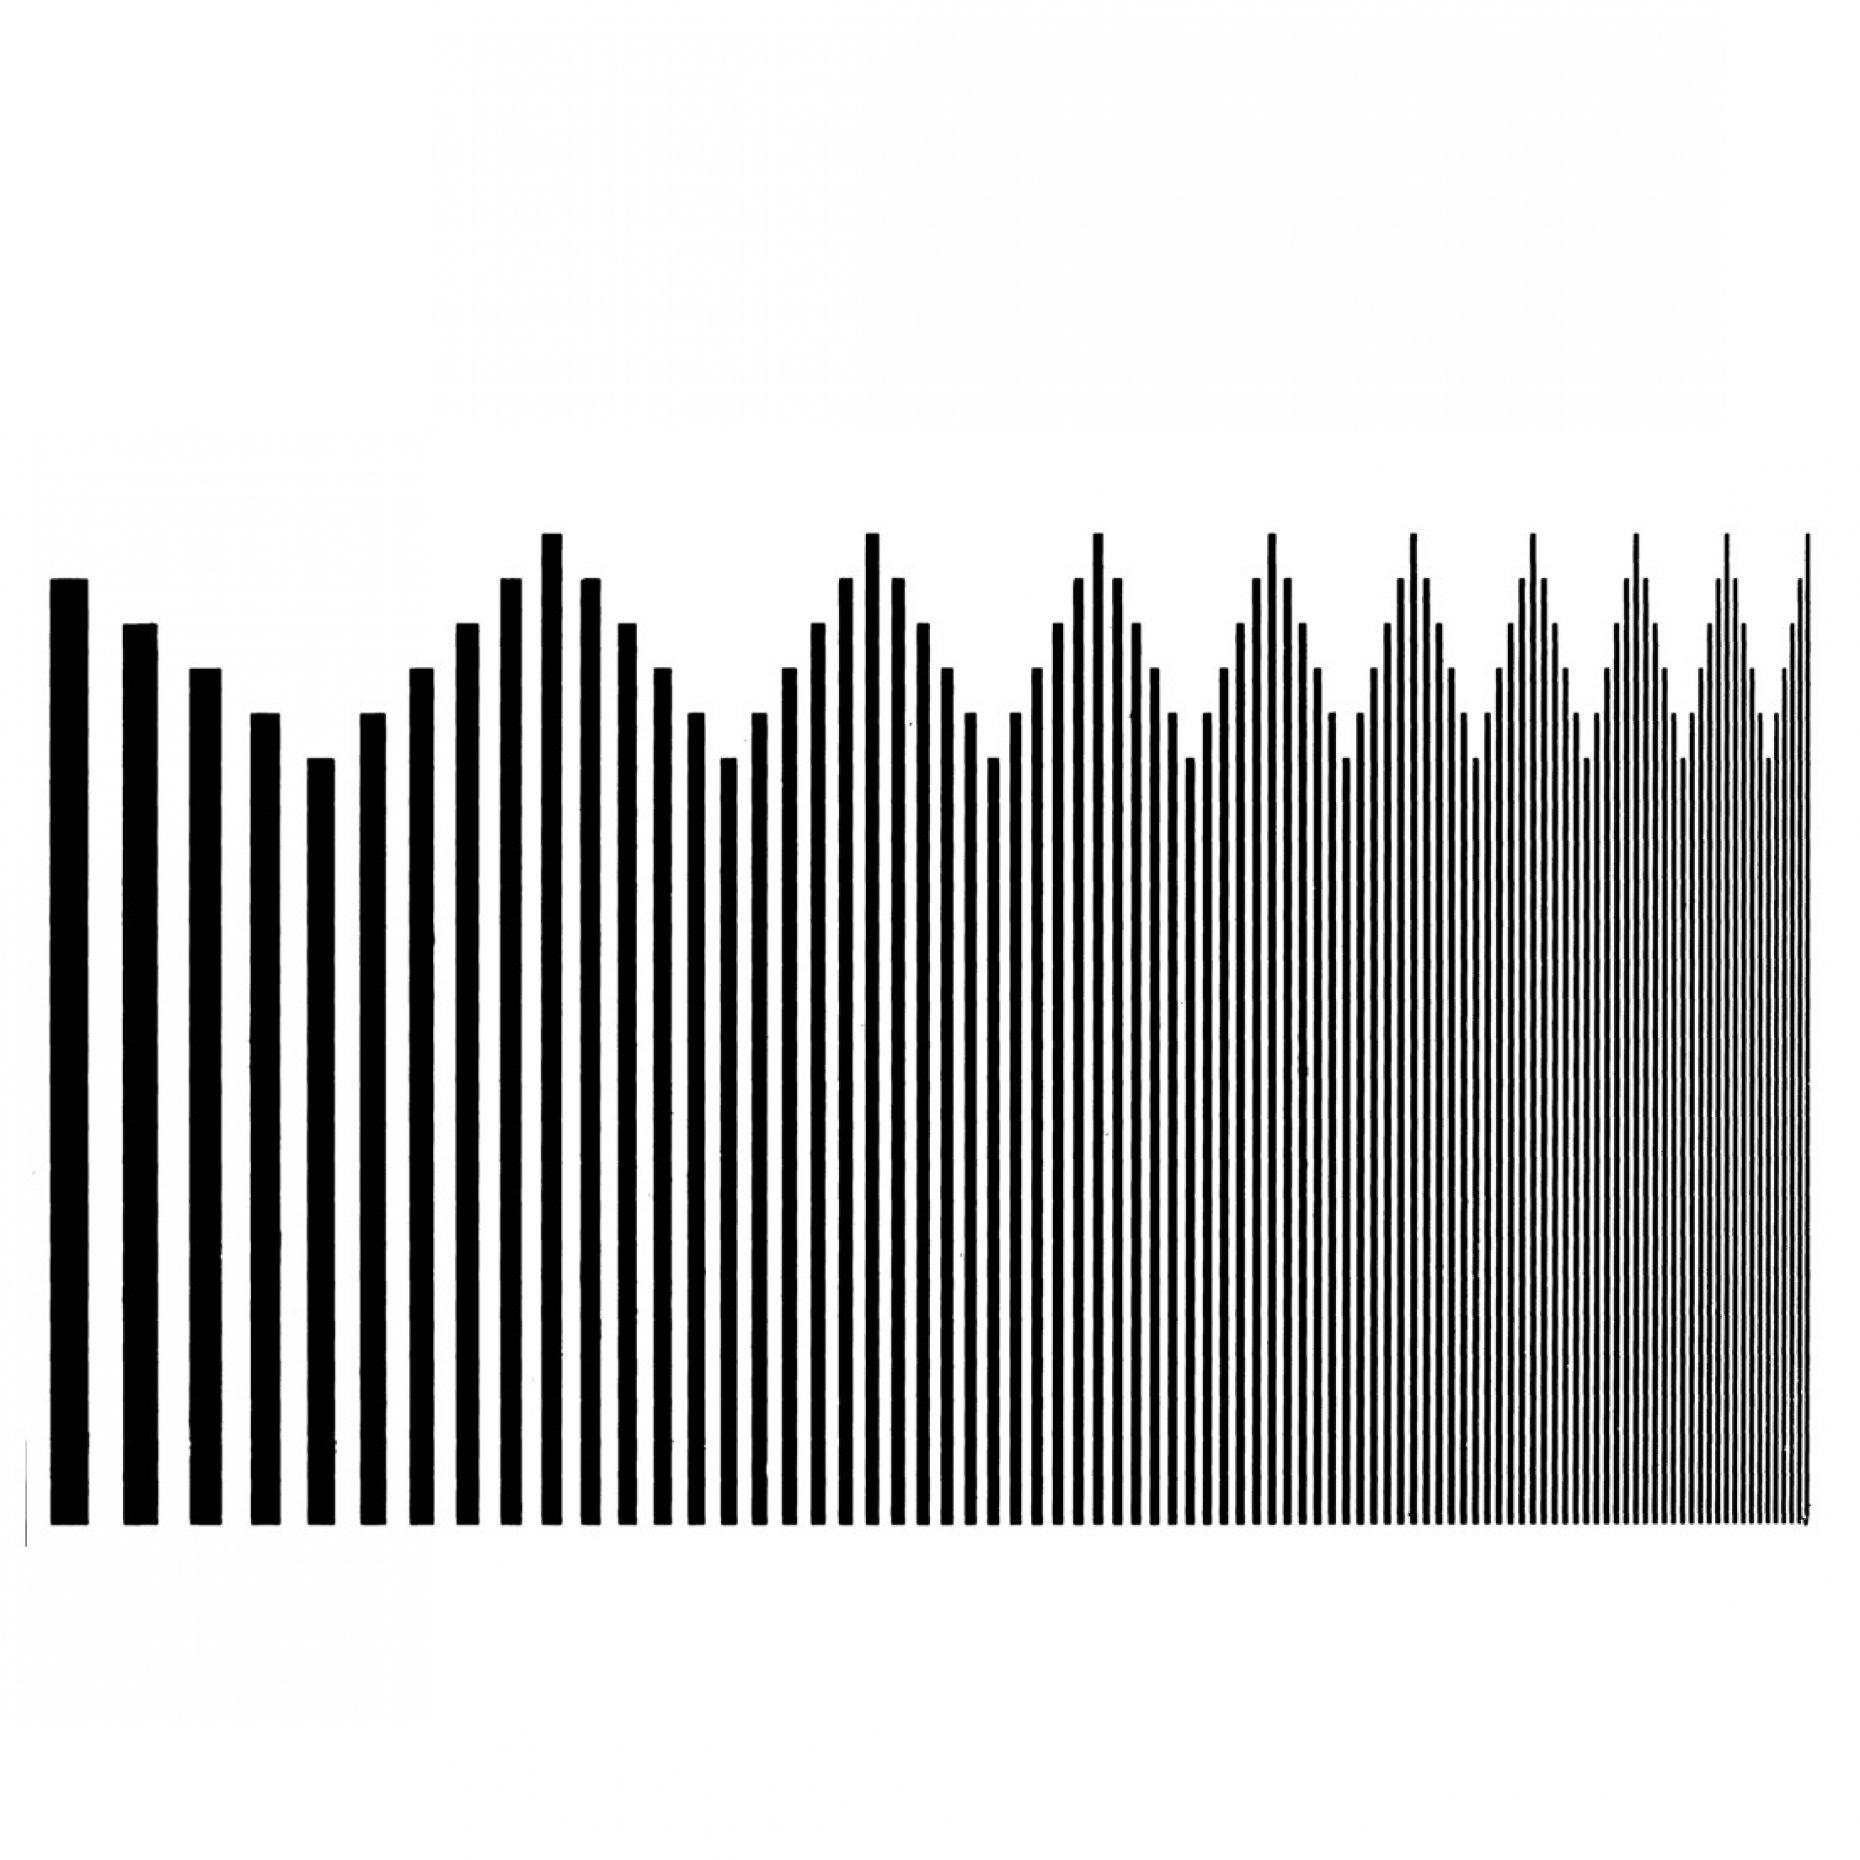 R72 Sayce Logarithmic Test Chart